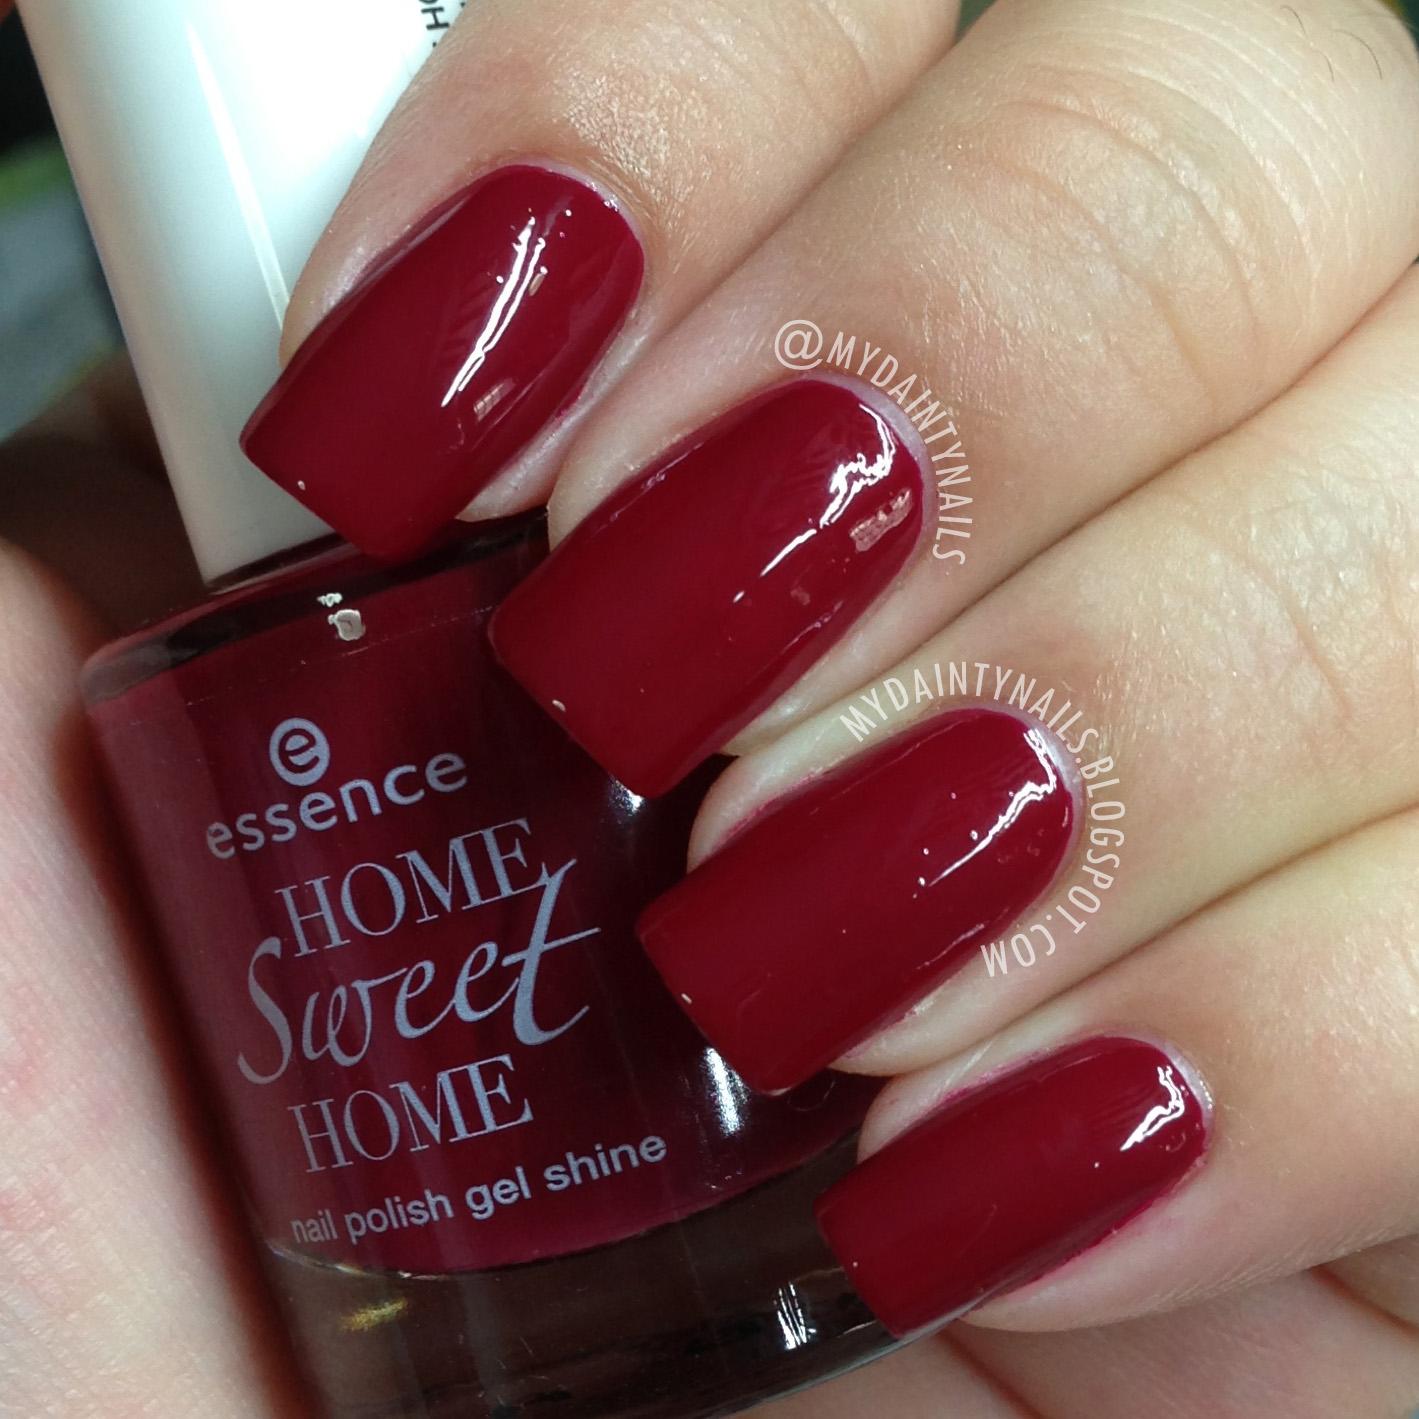 My Dainty Nails: Essence Home Sweet Home Nail Polish